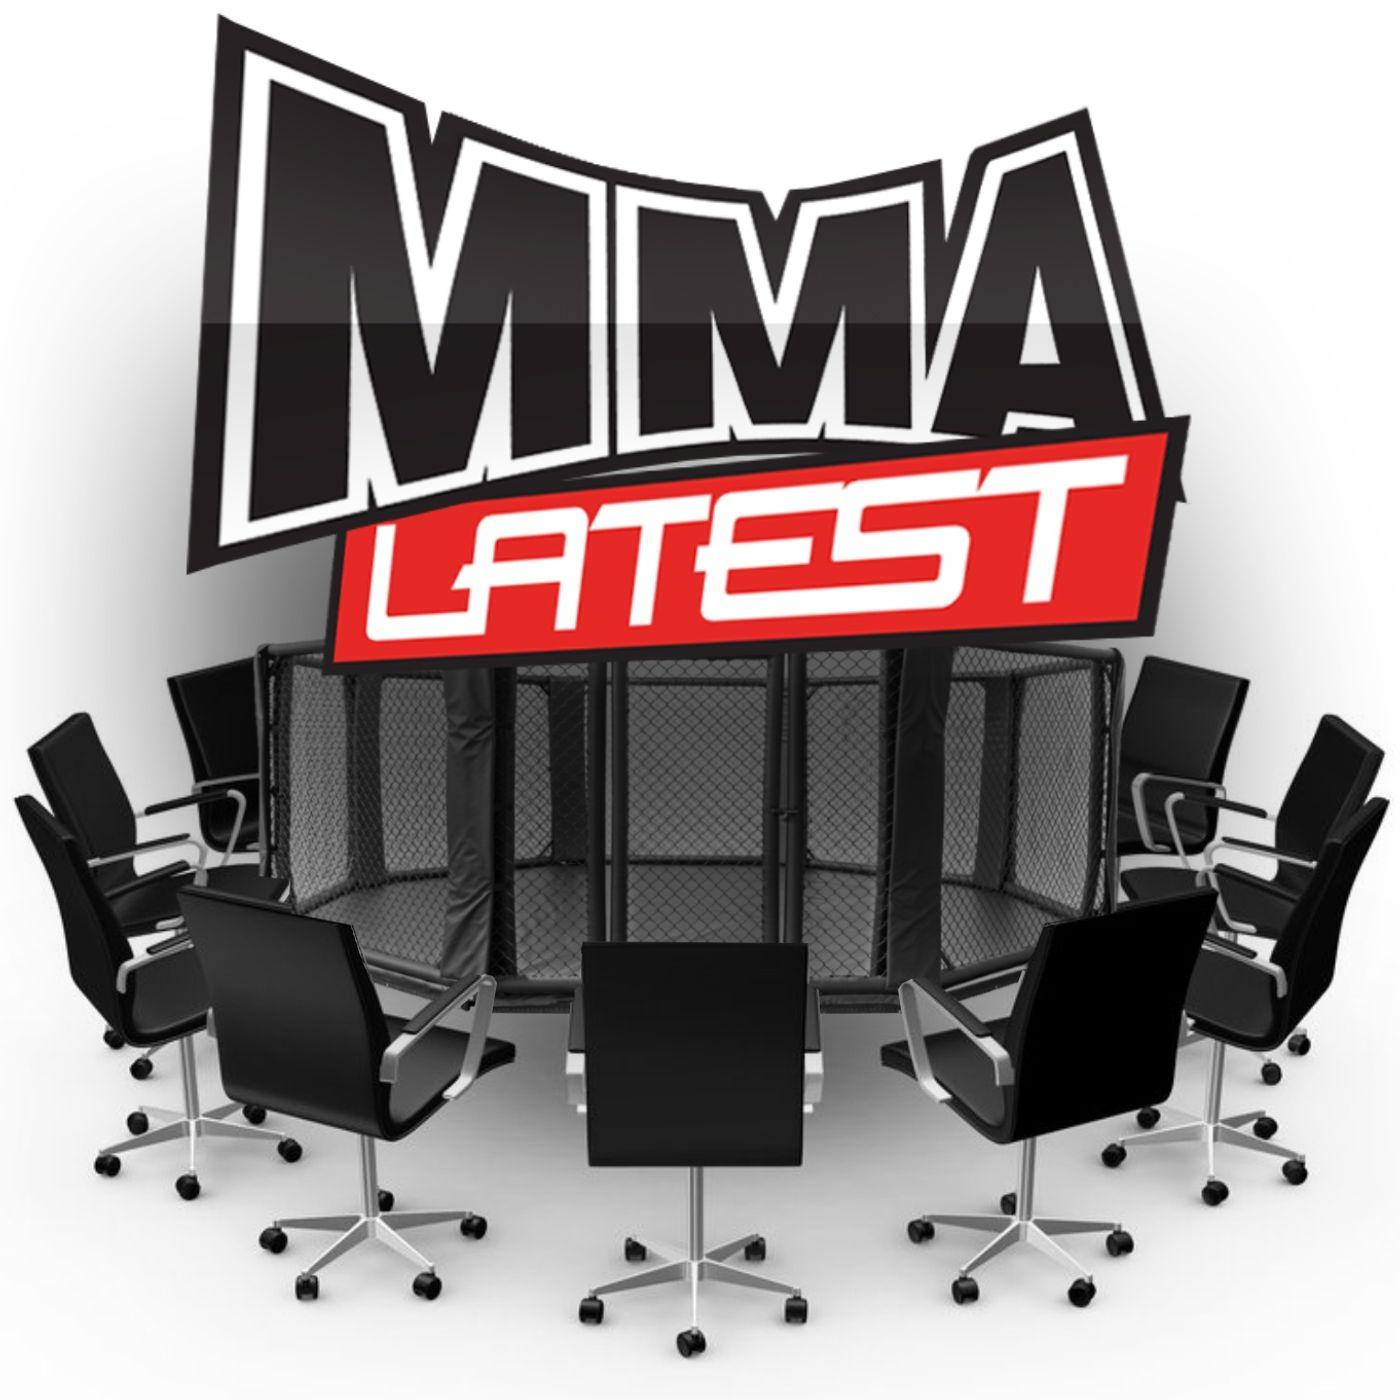 CESMMA Welterweight Champ Chris Curtis